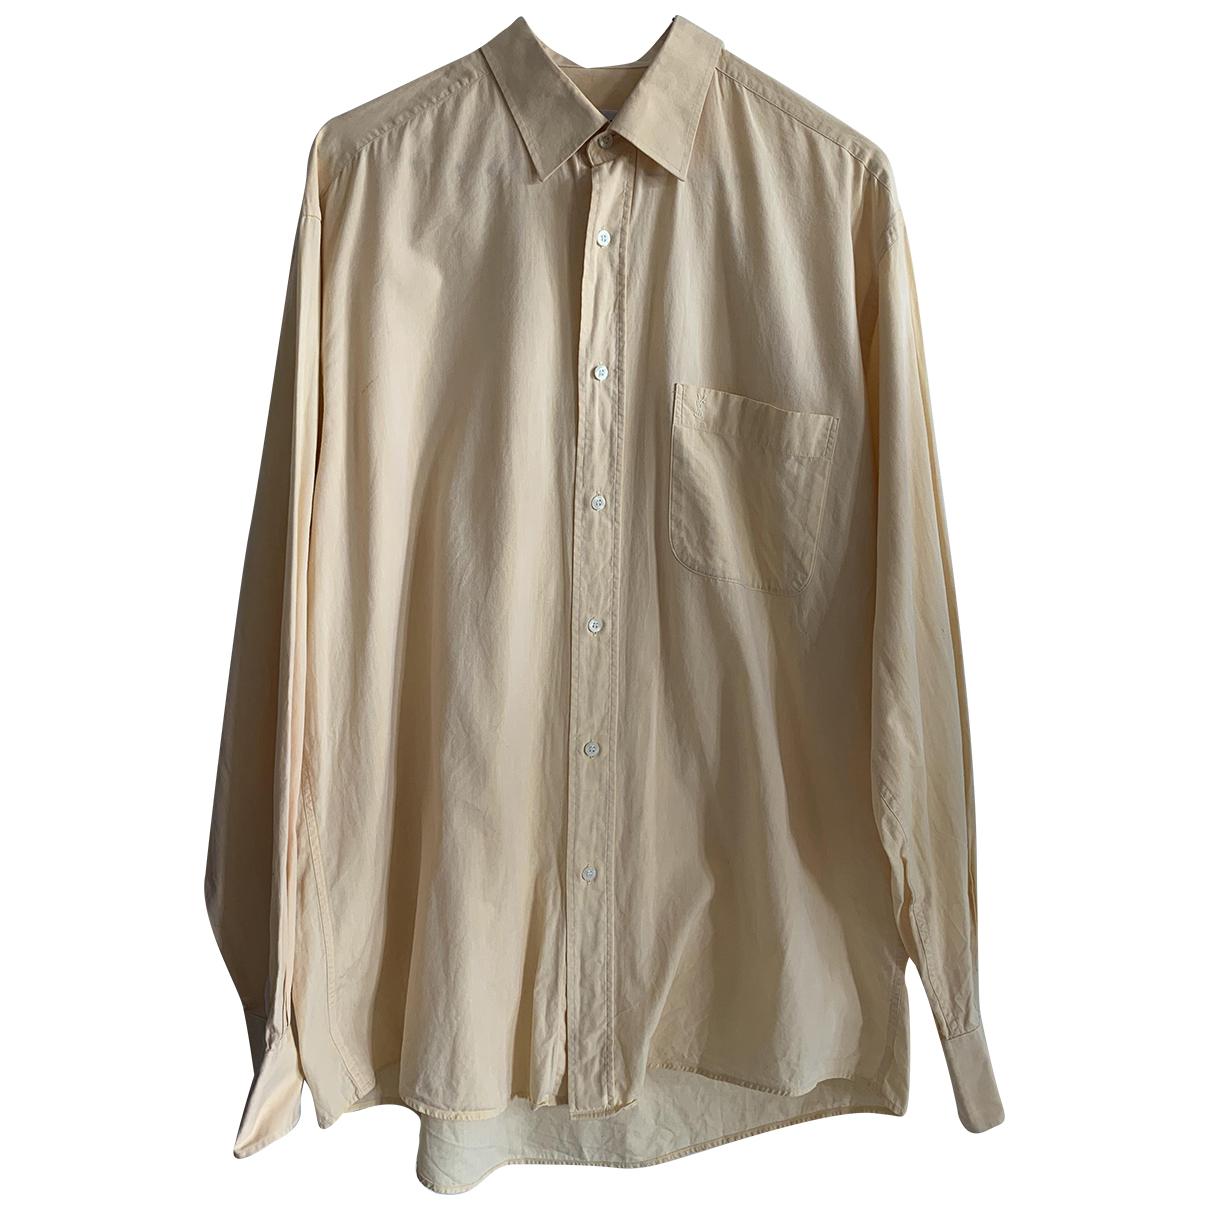 Yves Saint Laurent \N Yellow Cotton Shirts for Men 40 EU (tour de cou / collar)